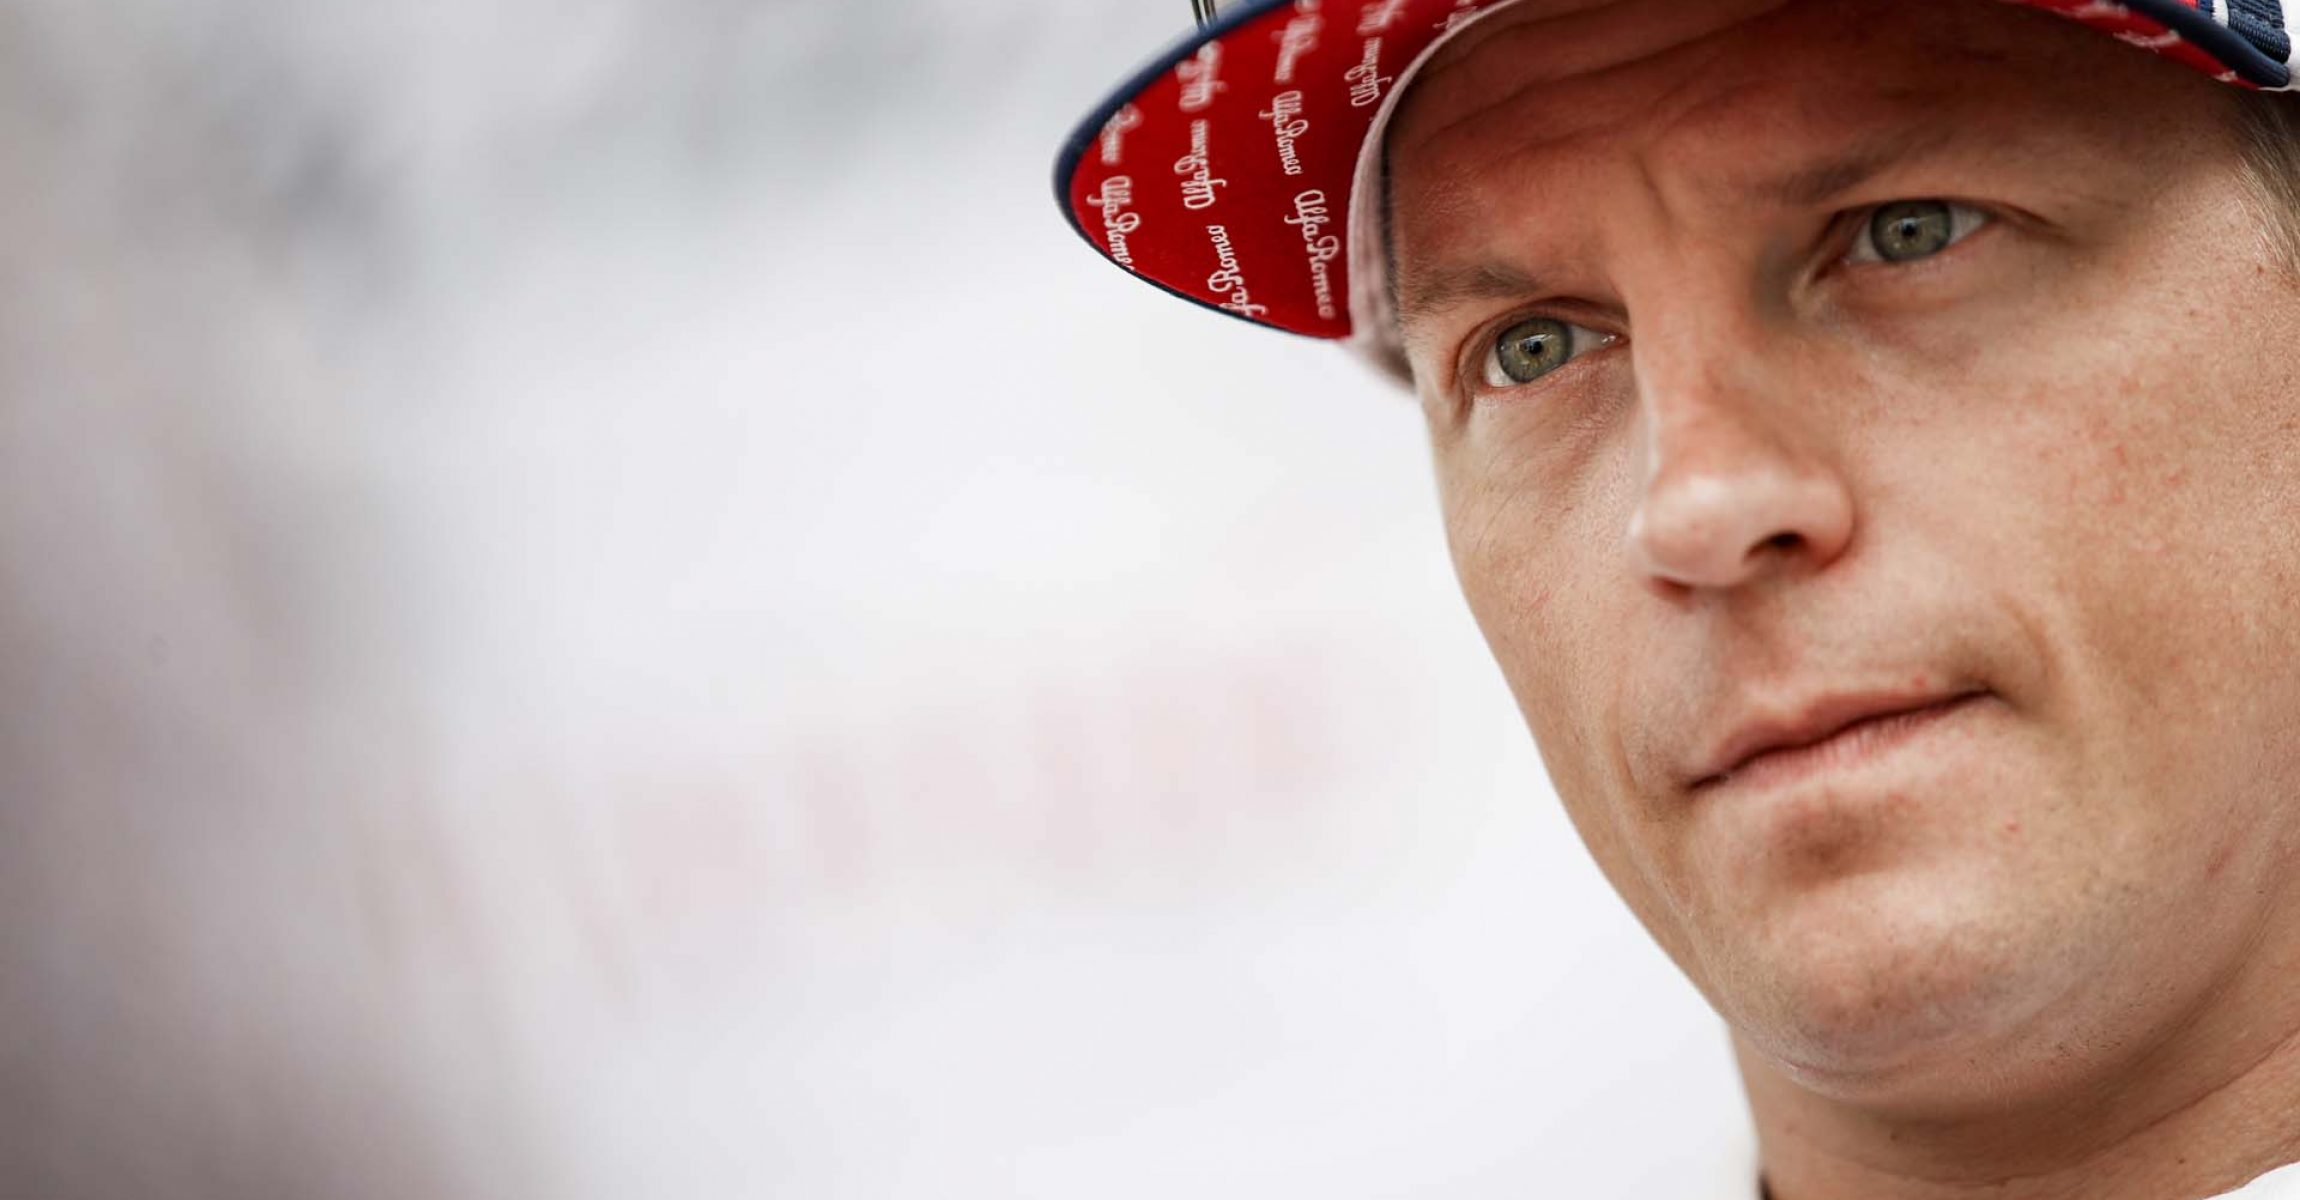 RAIKKONEN Kimi Räikkönen (fin), Alfa Romeo Racing C38, portrait during 2019 Formula 1 FIA world championship, Italy Grand Prix, at Monza from september 5 to 9  - Photo Florent Gooden / DPPI